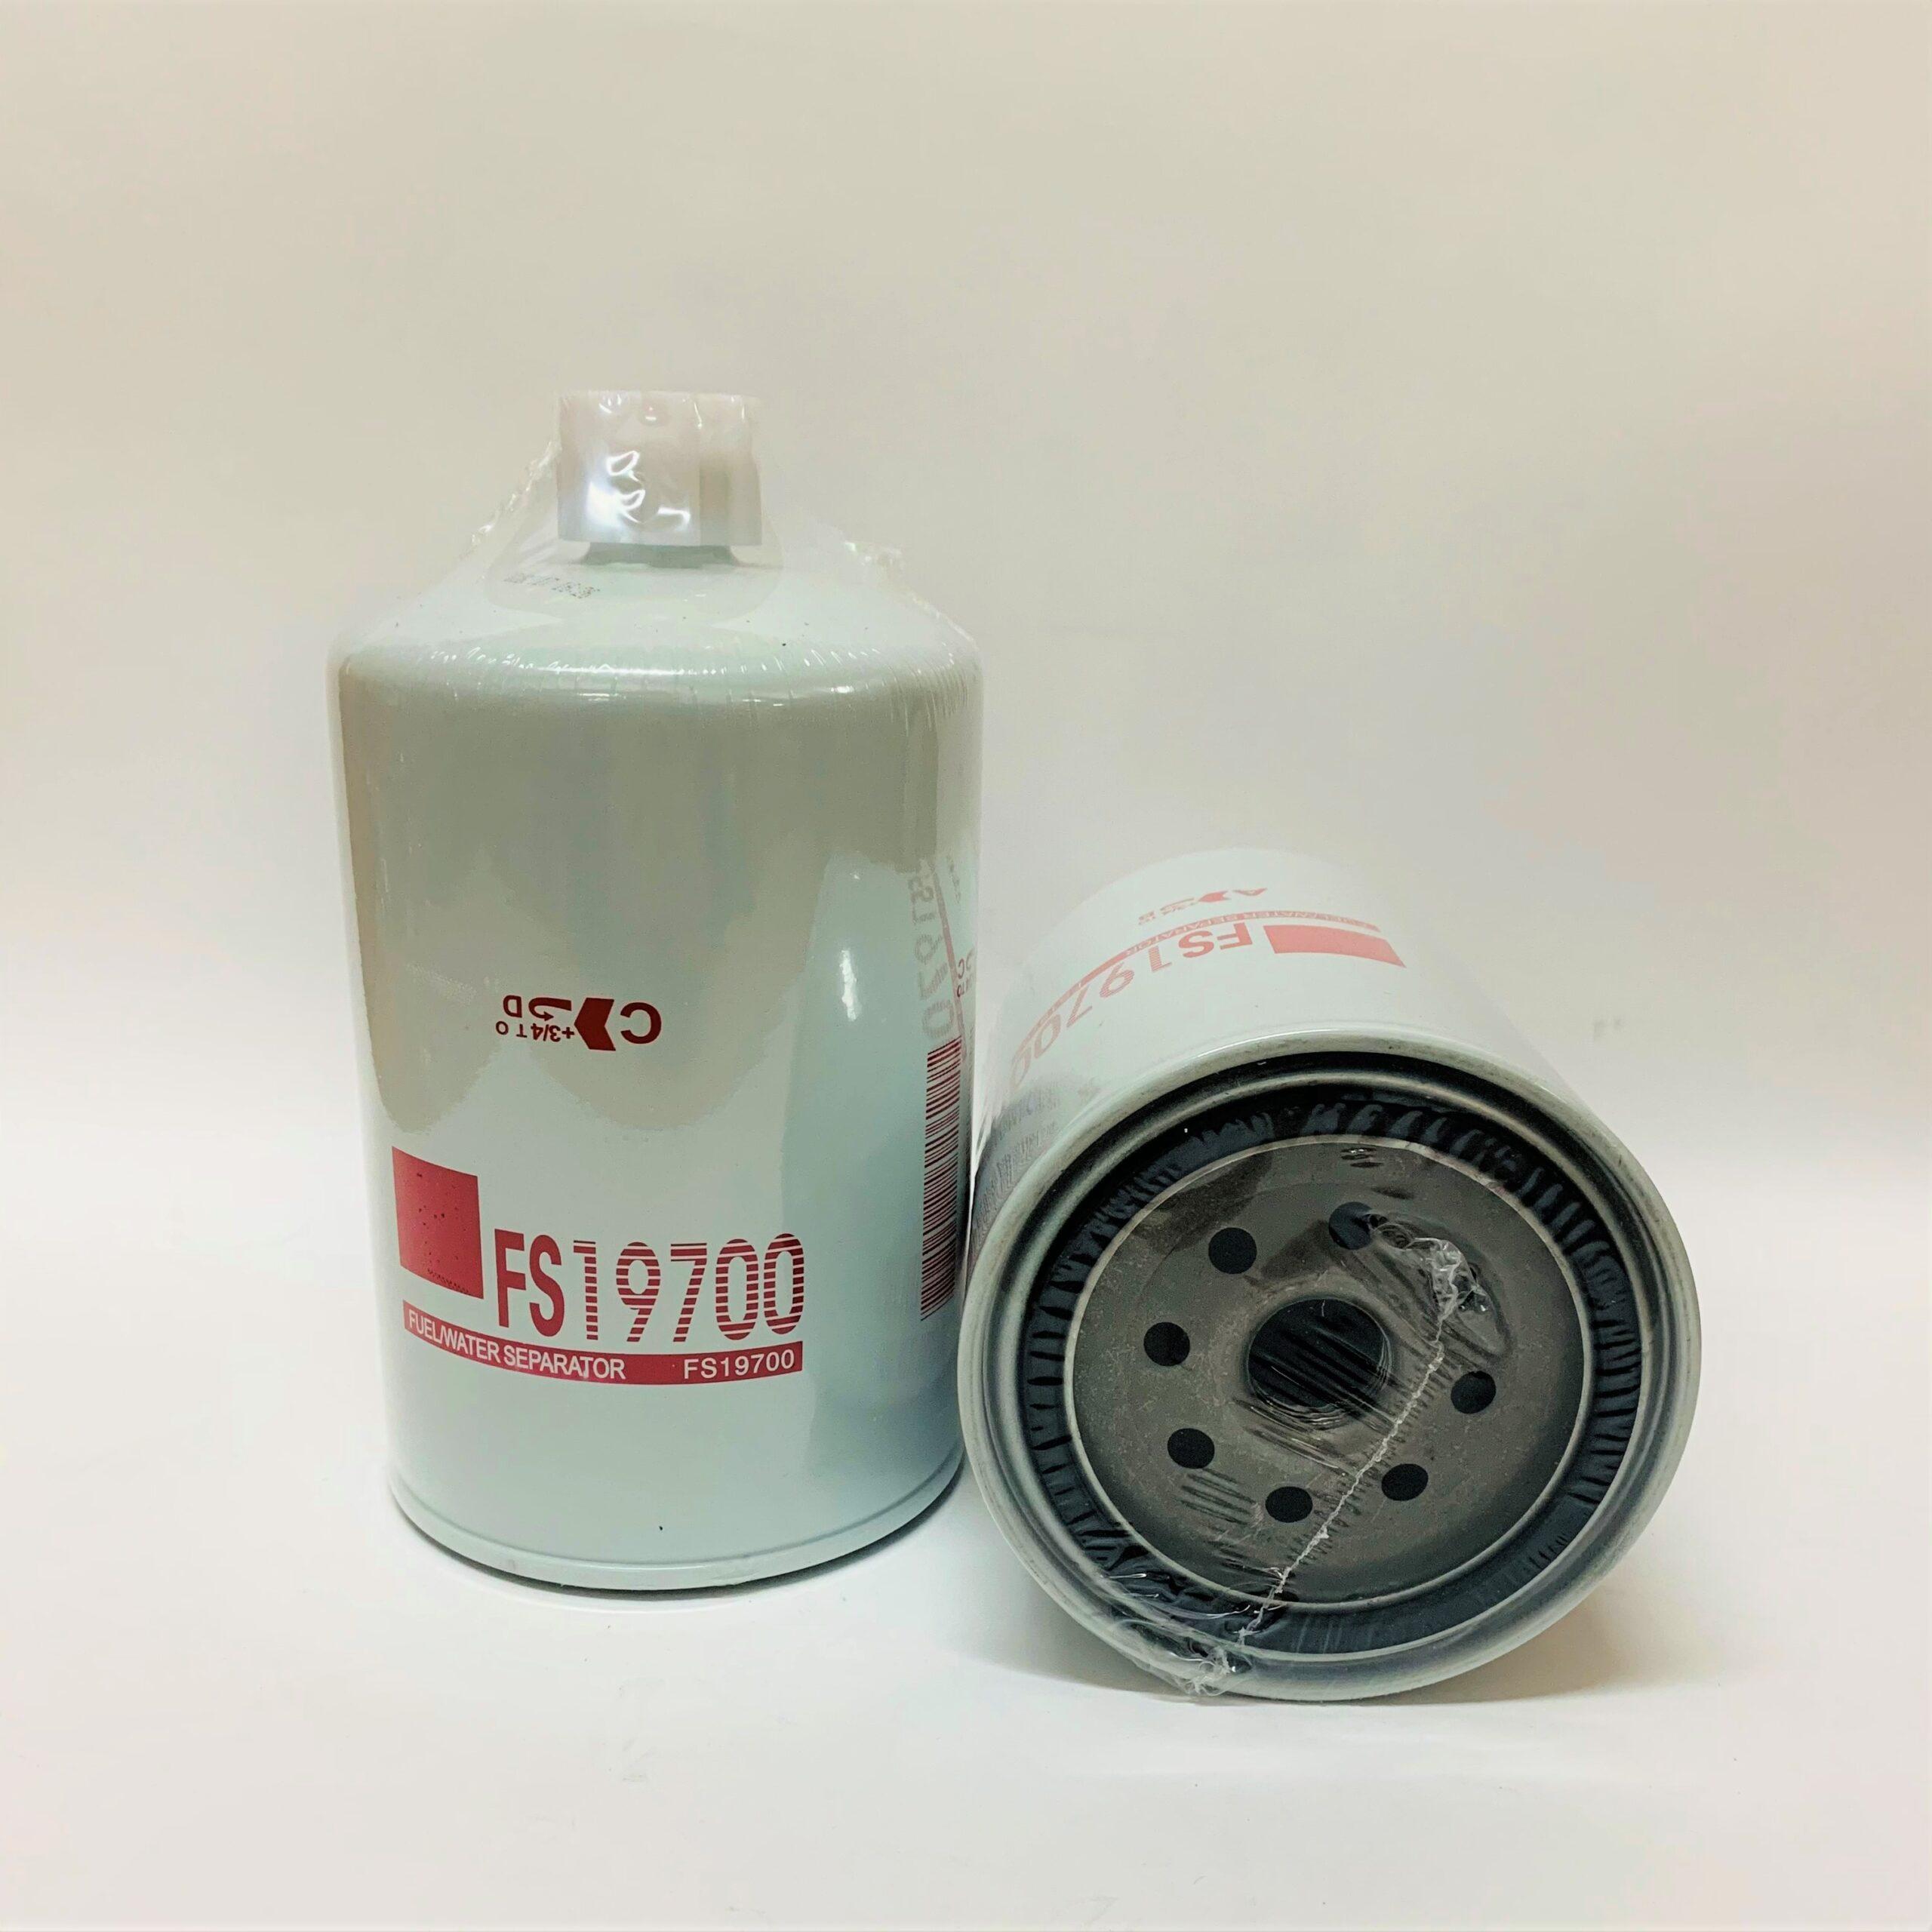 FS19700